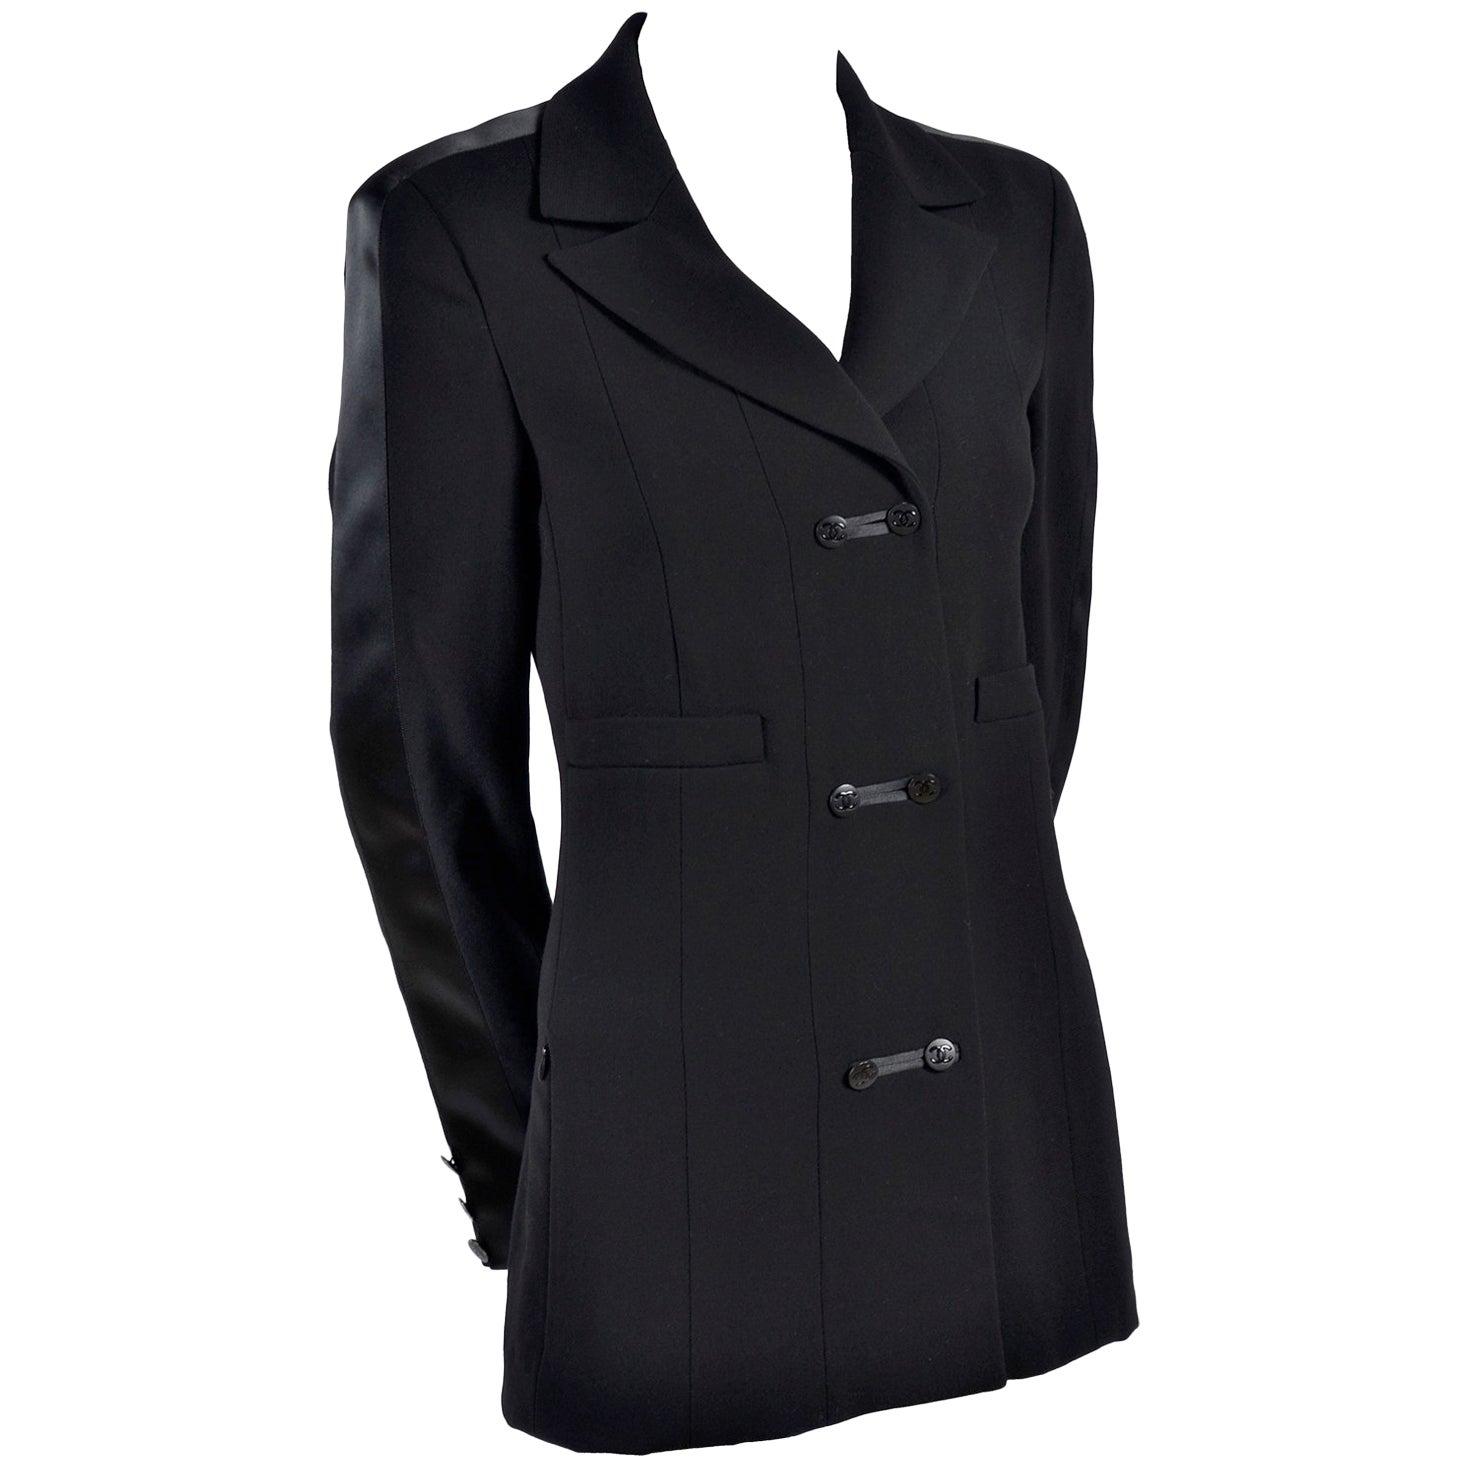 2003 Chanel Jacket Black Wool Blazer W Satin Stripes in Size 38